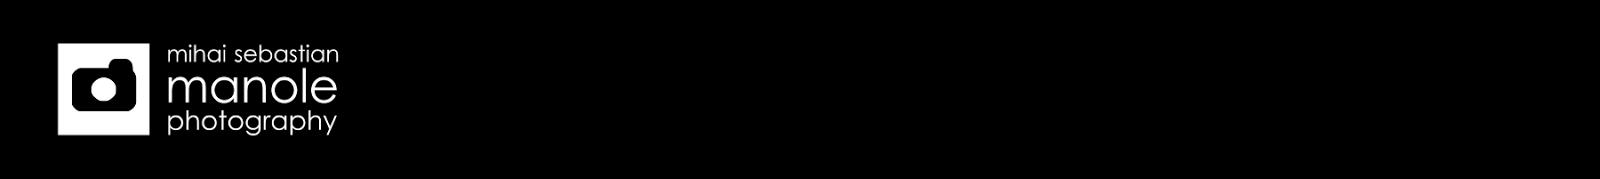 MIHAI SEBASTIAN MANOLE